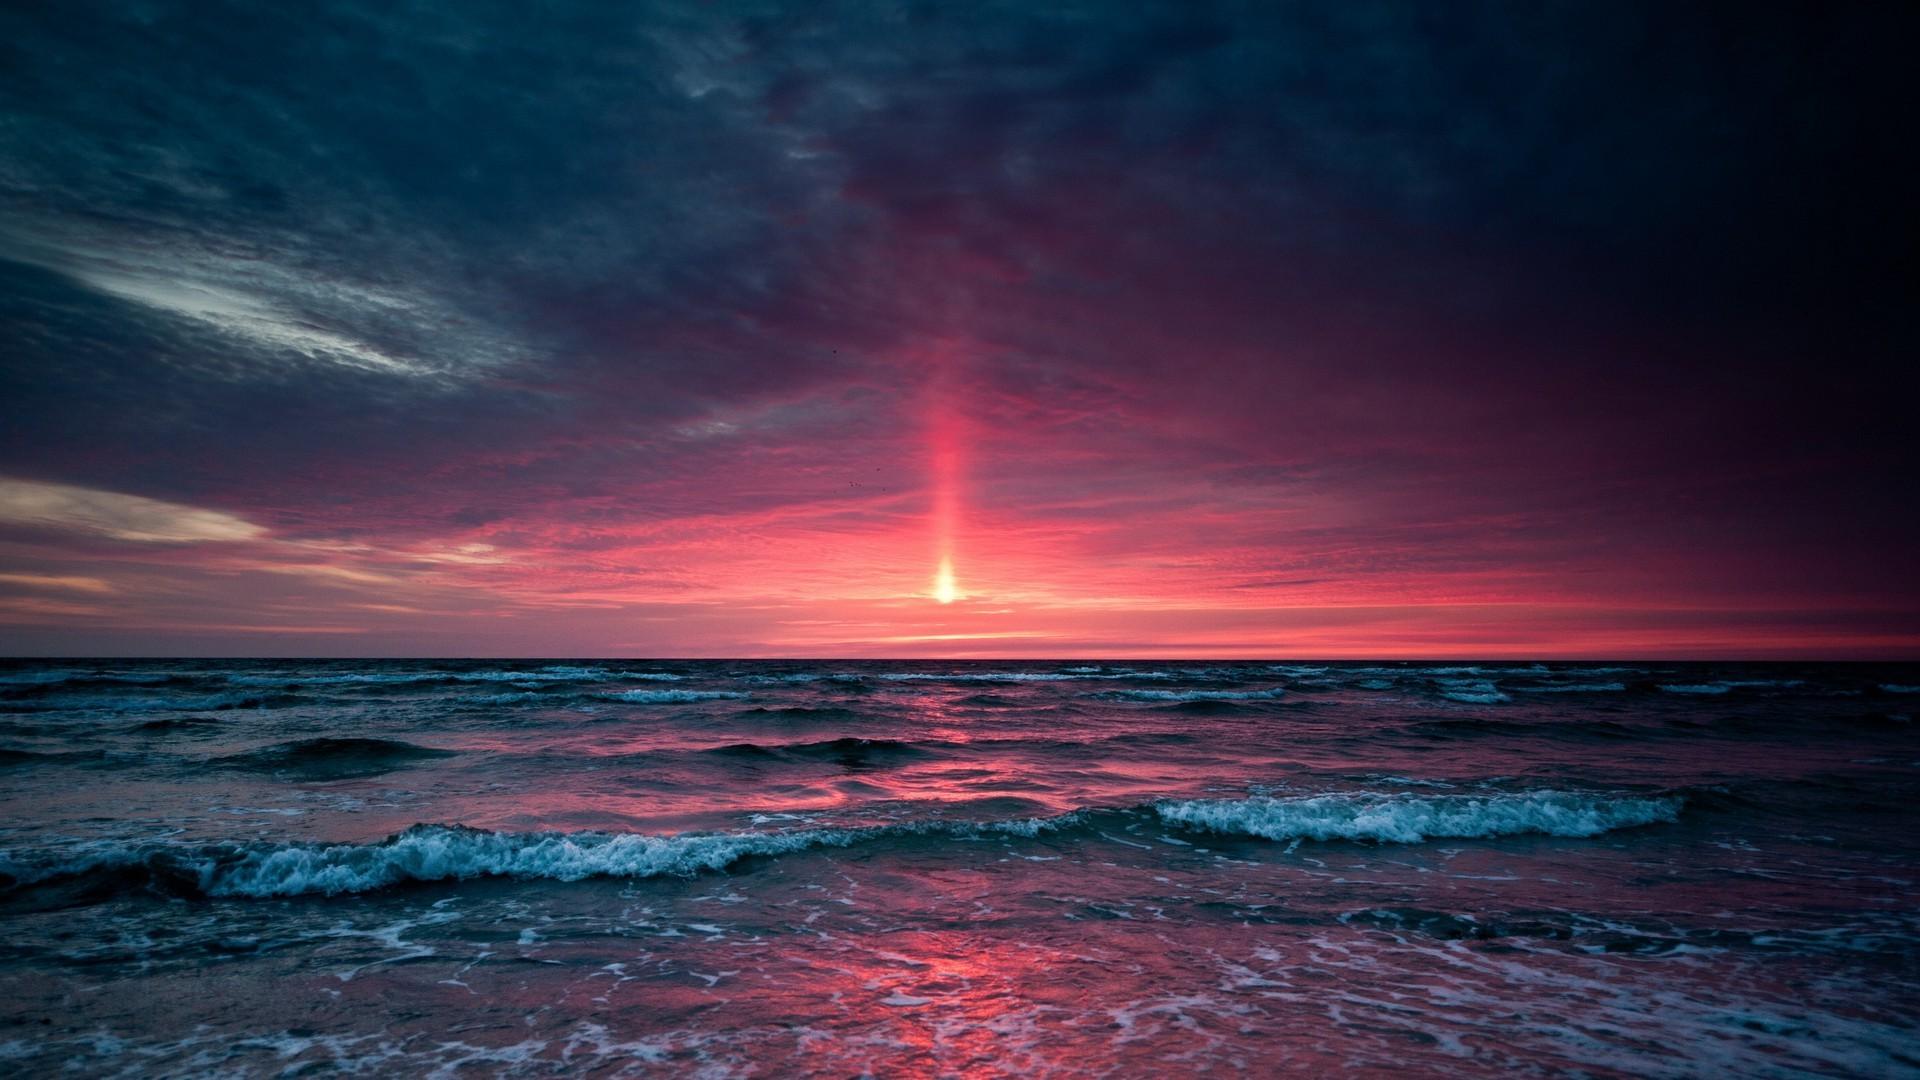 Stunning sunset above the ocean wallpaper